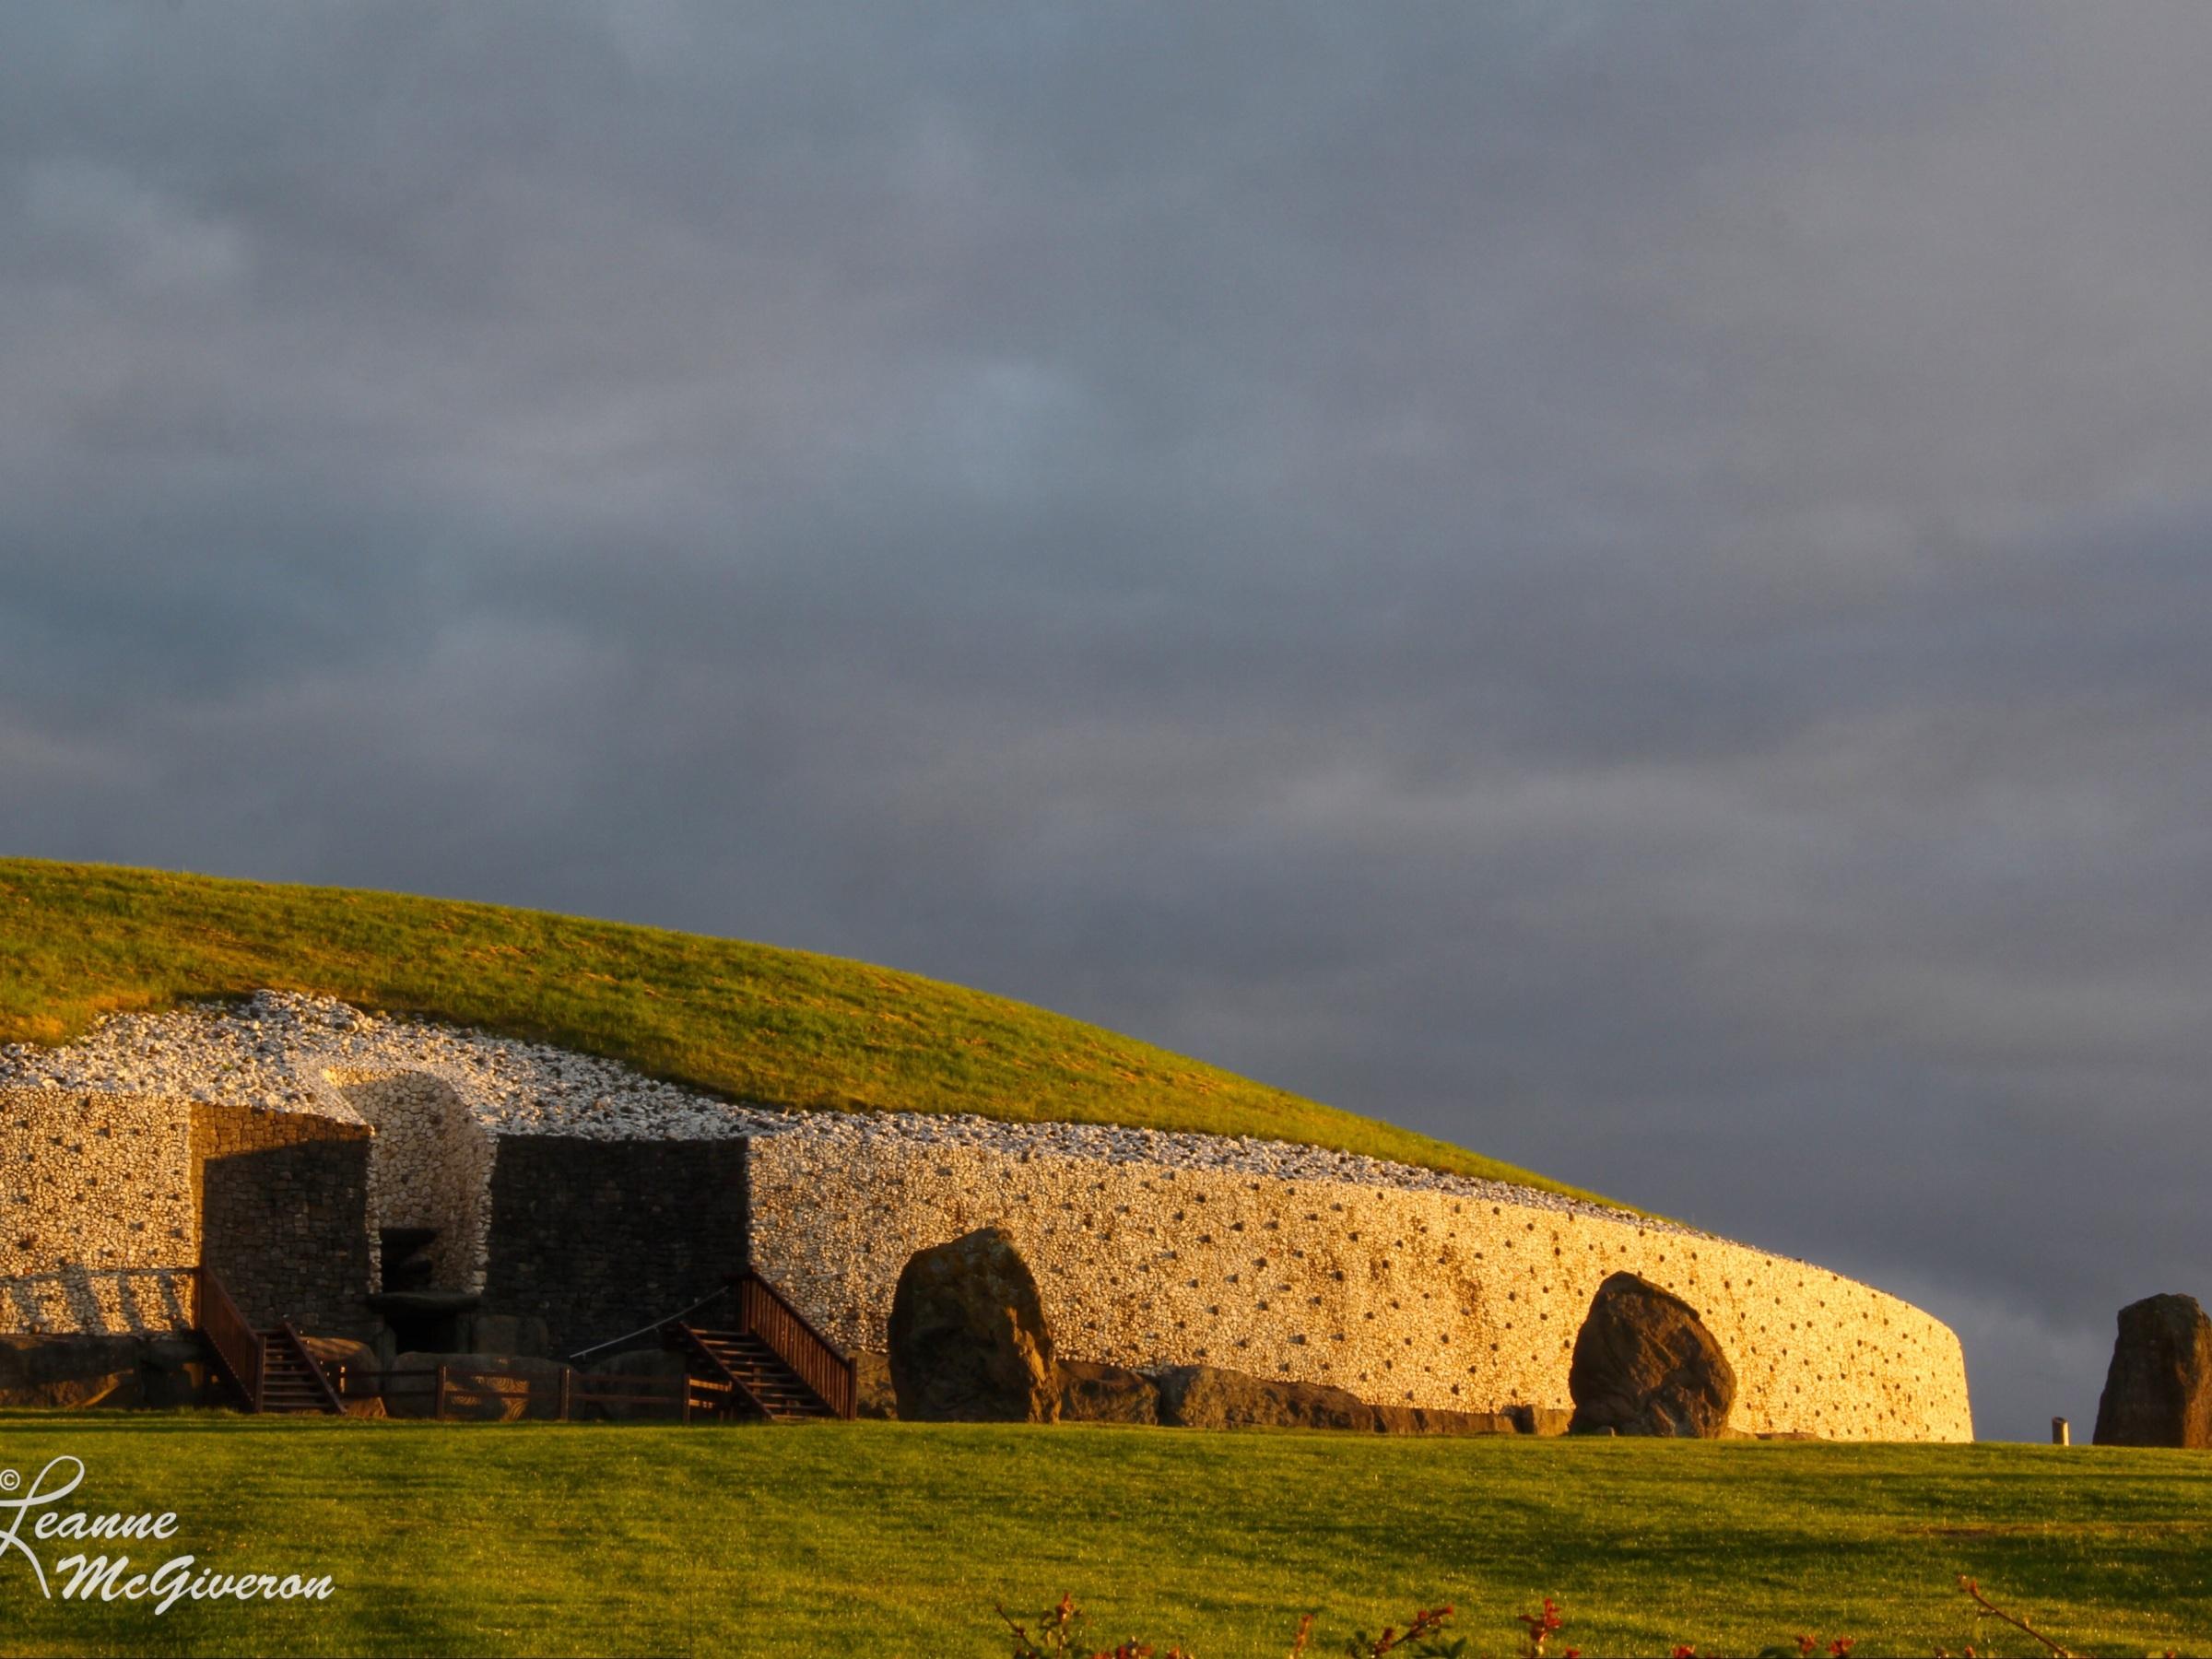 Summer Solstice Sunrise at Newgrange, County Meath